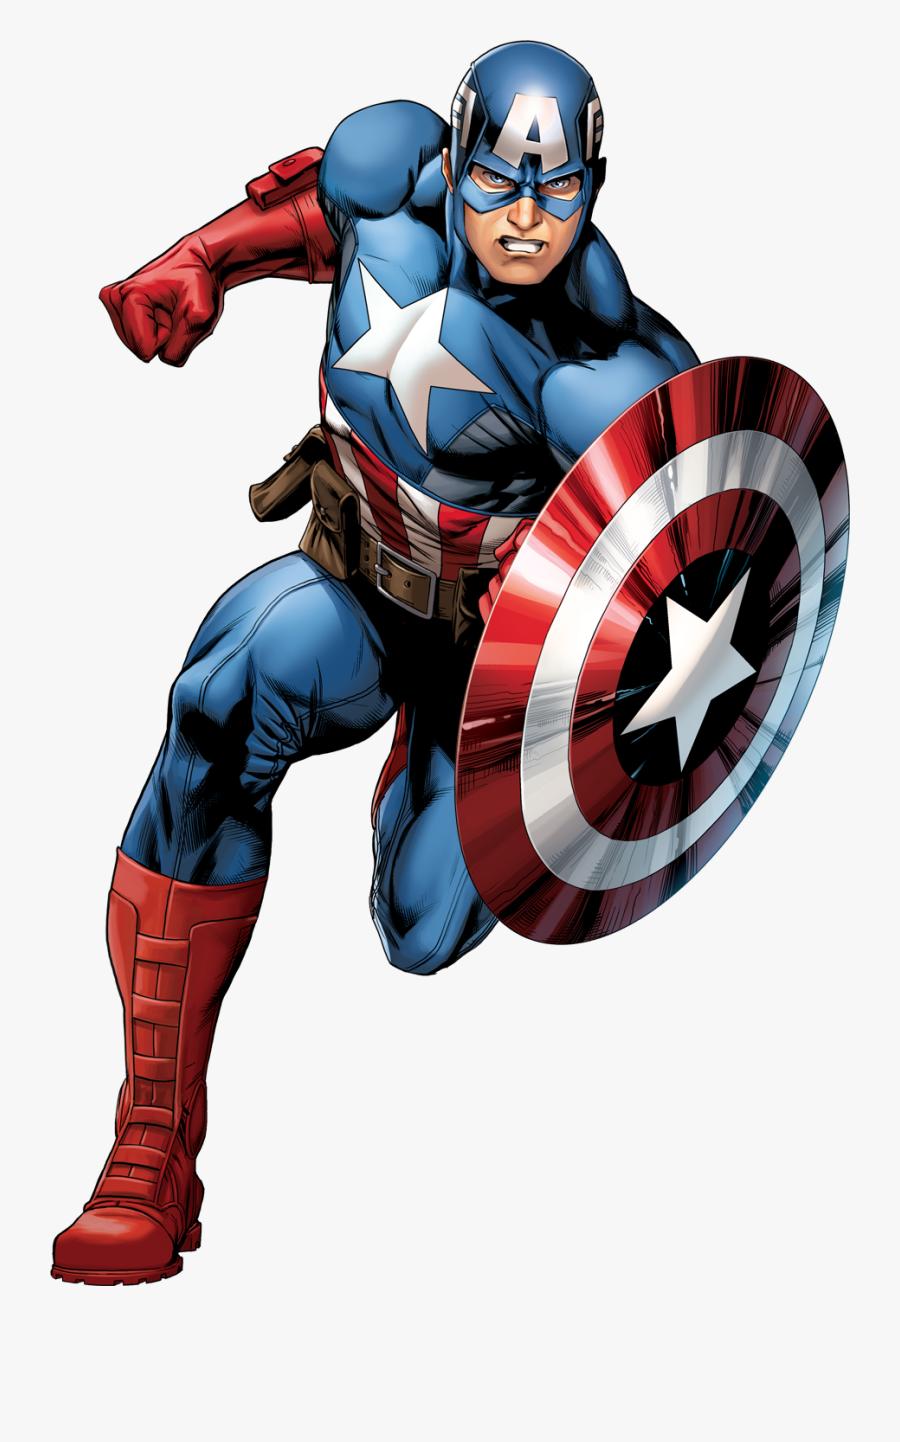 Captain America Png - Capitan America Comic Png, Transparent Clipart